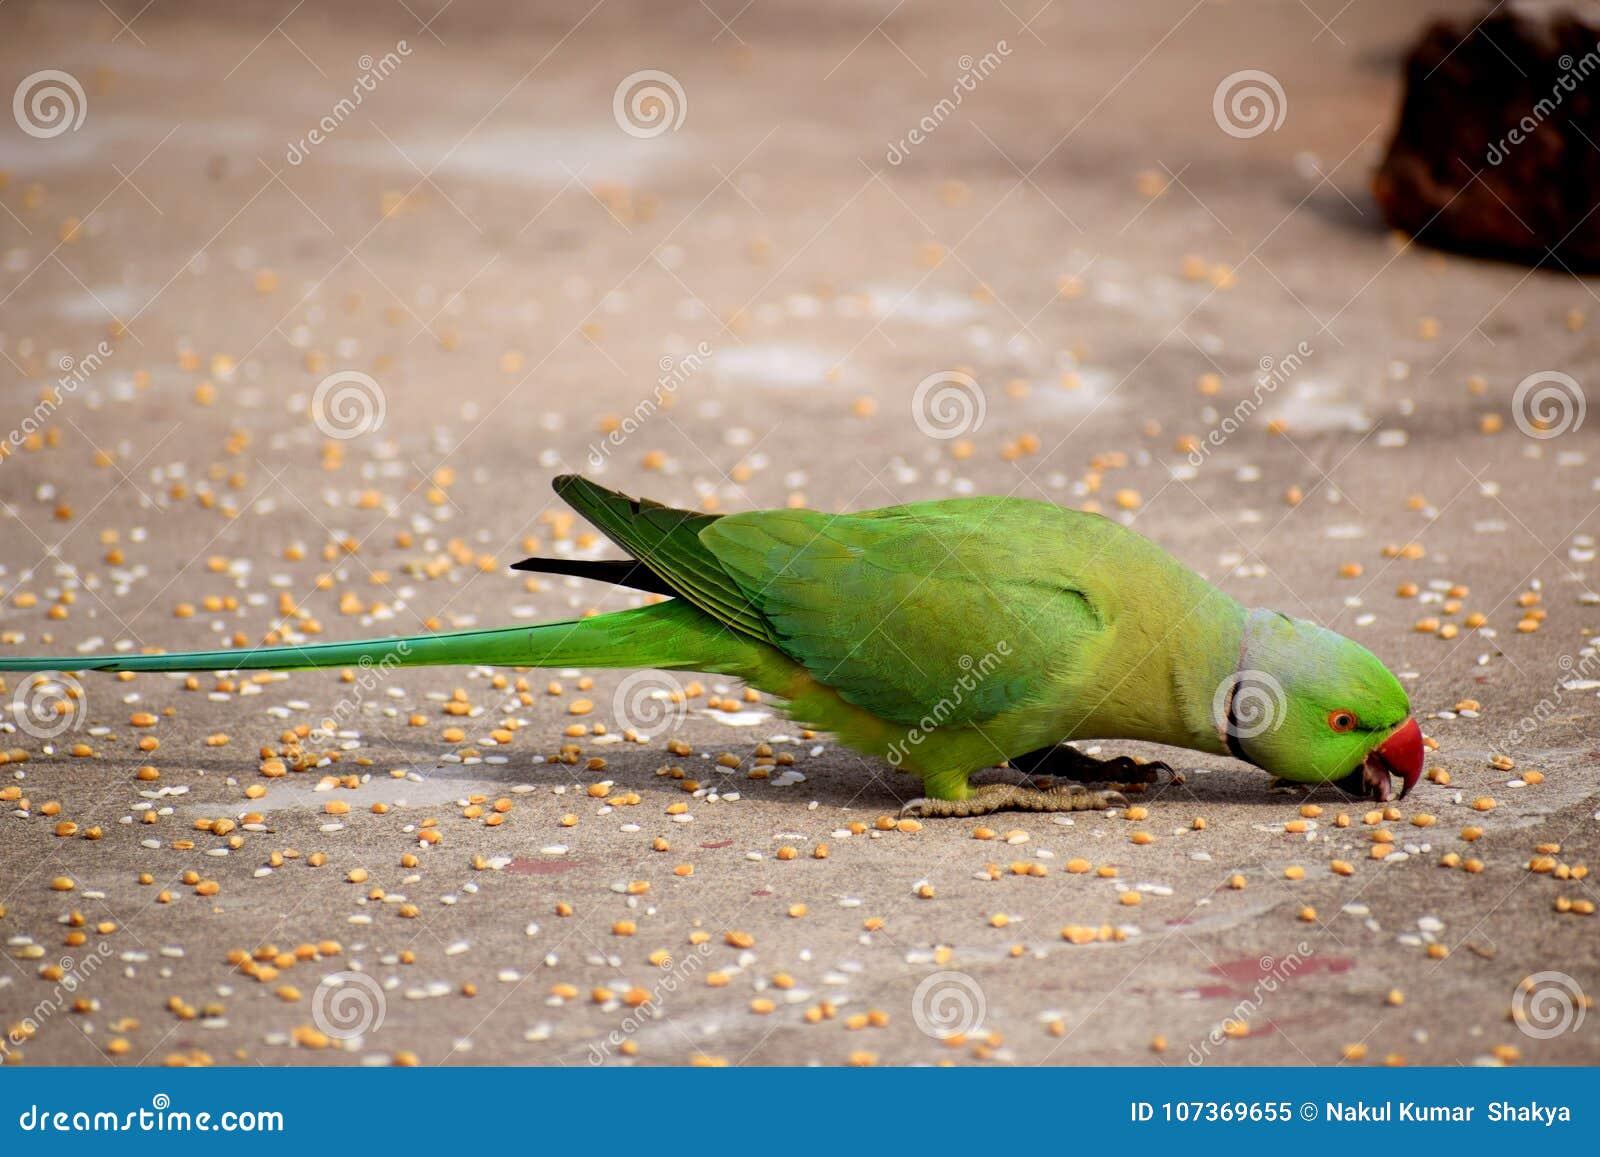 Parrot picking grains with beak